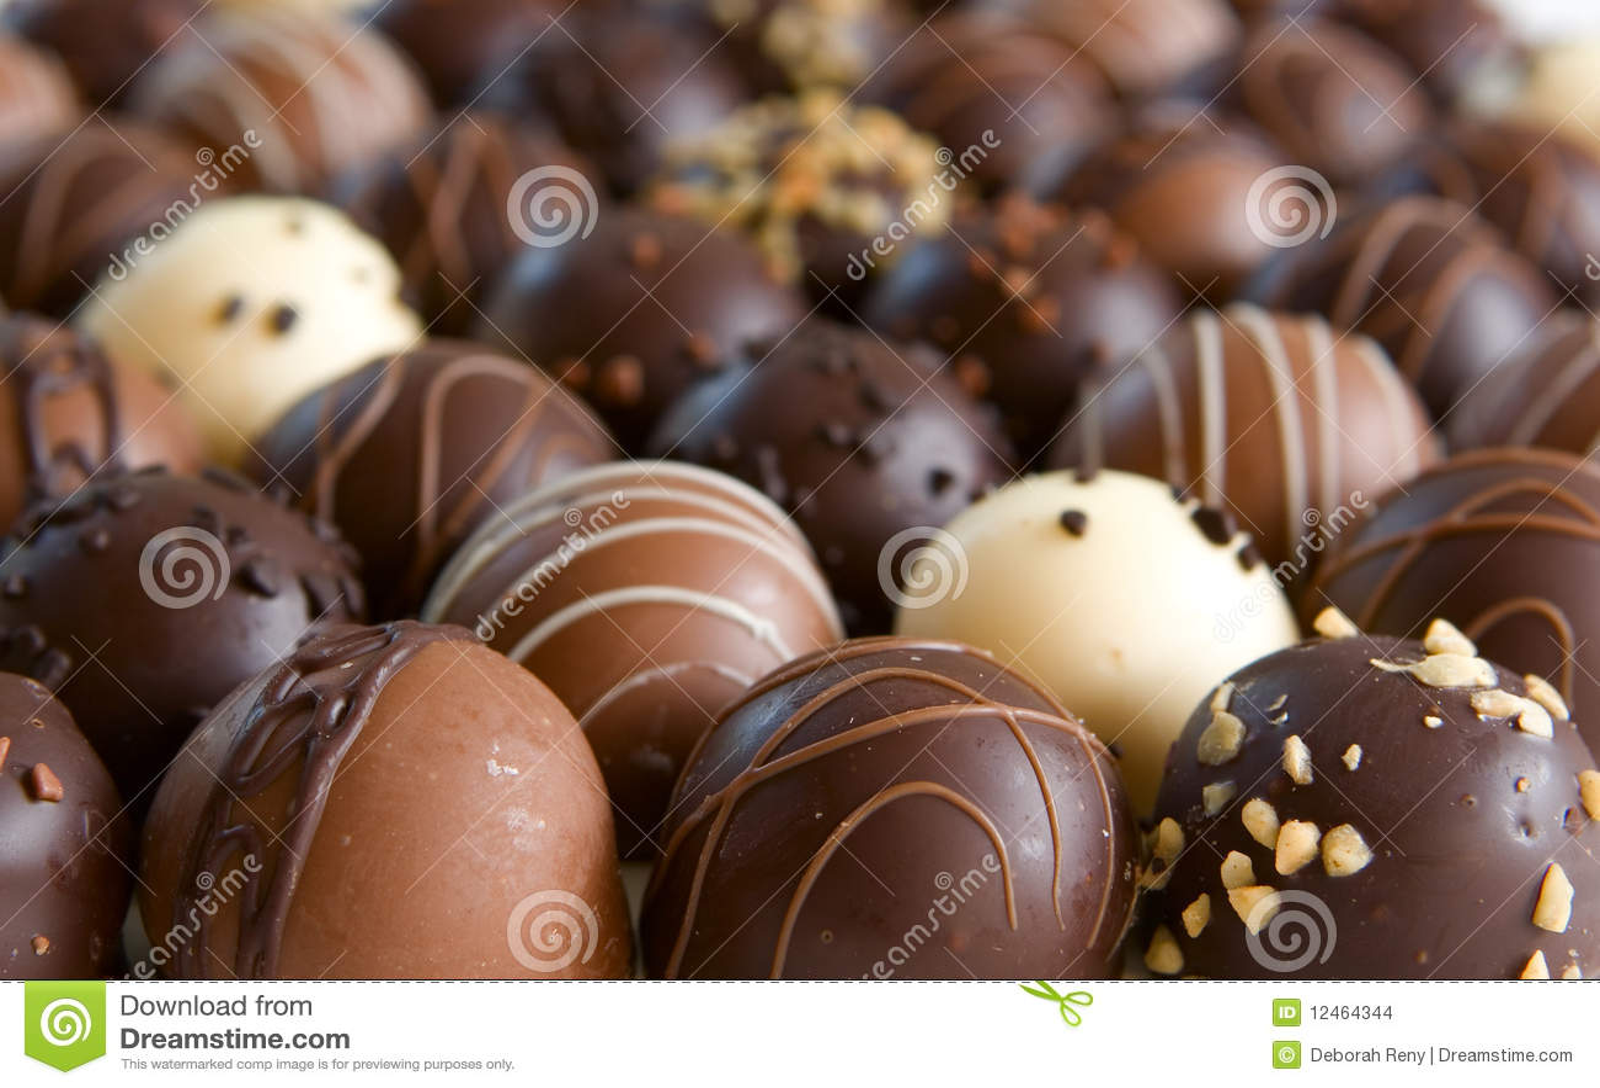 Chocolate Truffle Candy Background Stock Images Image